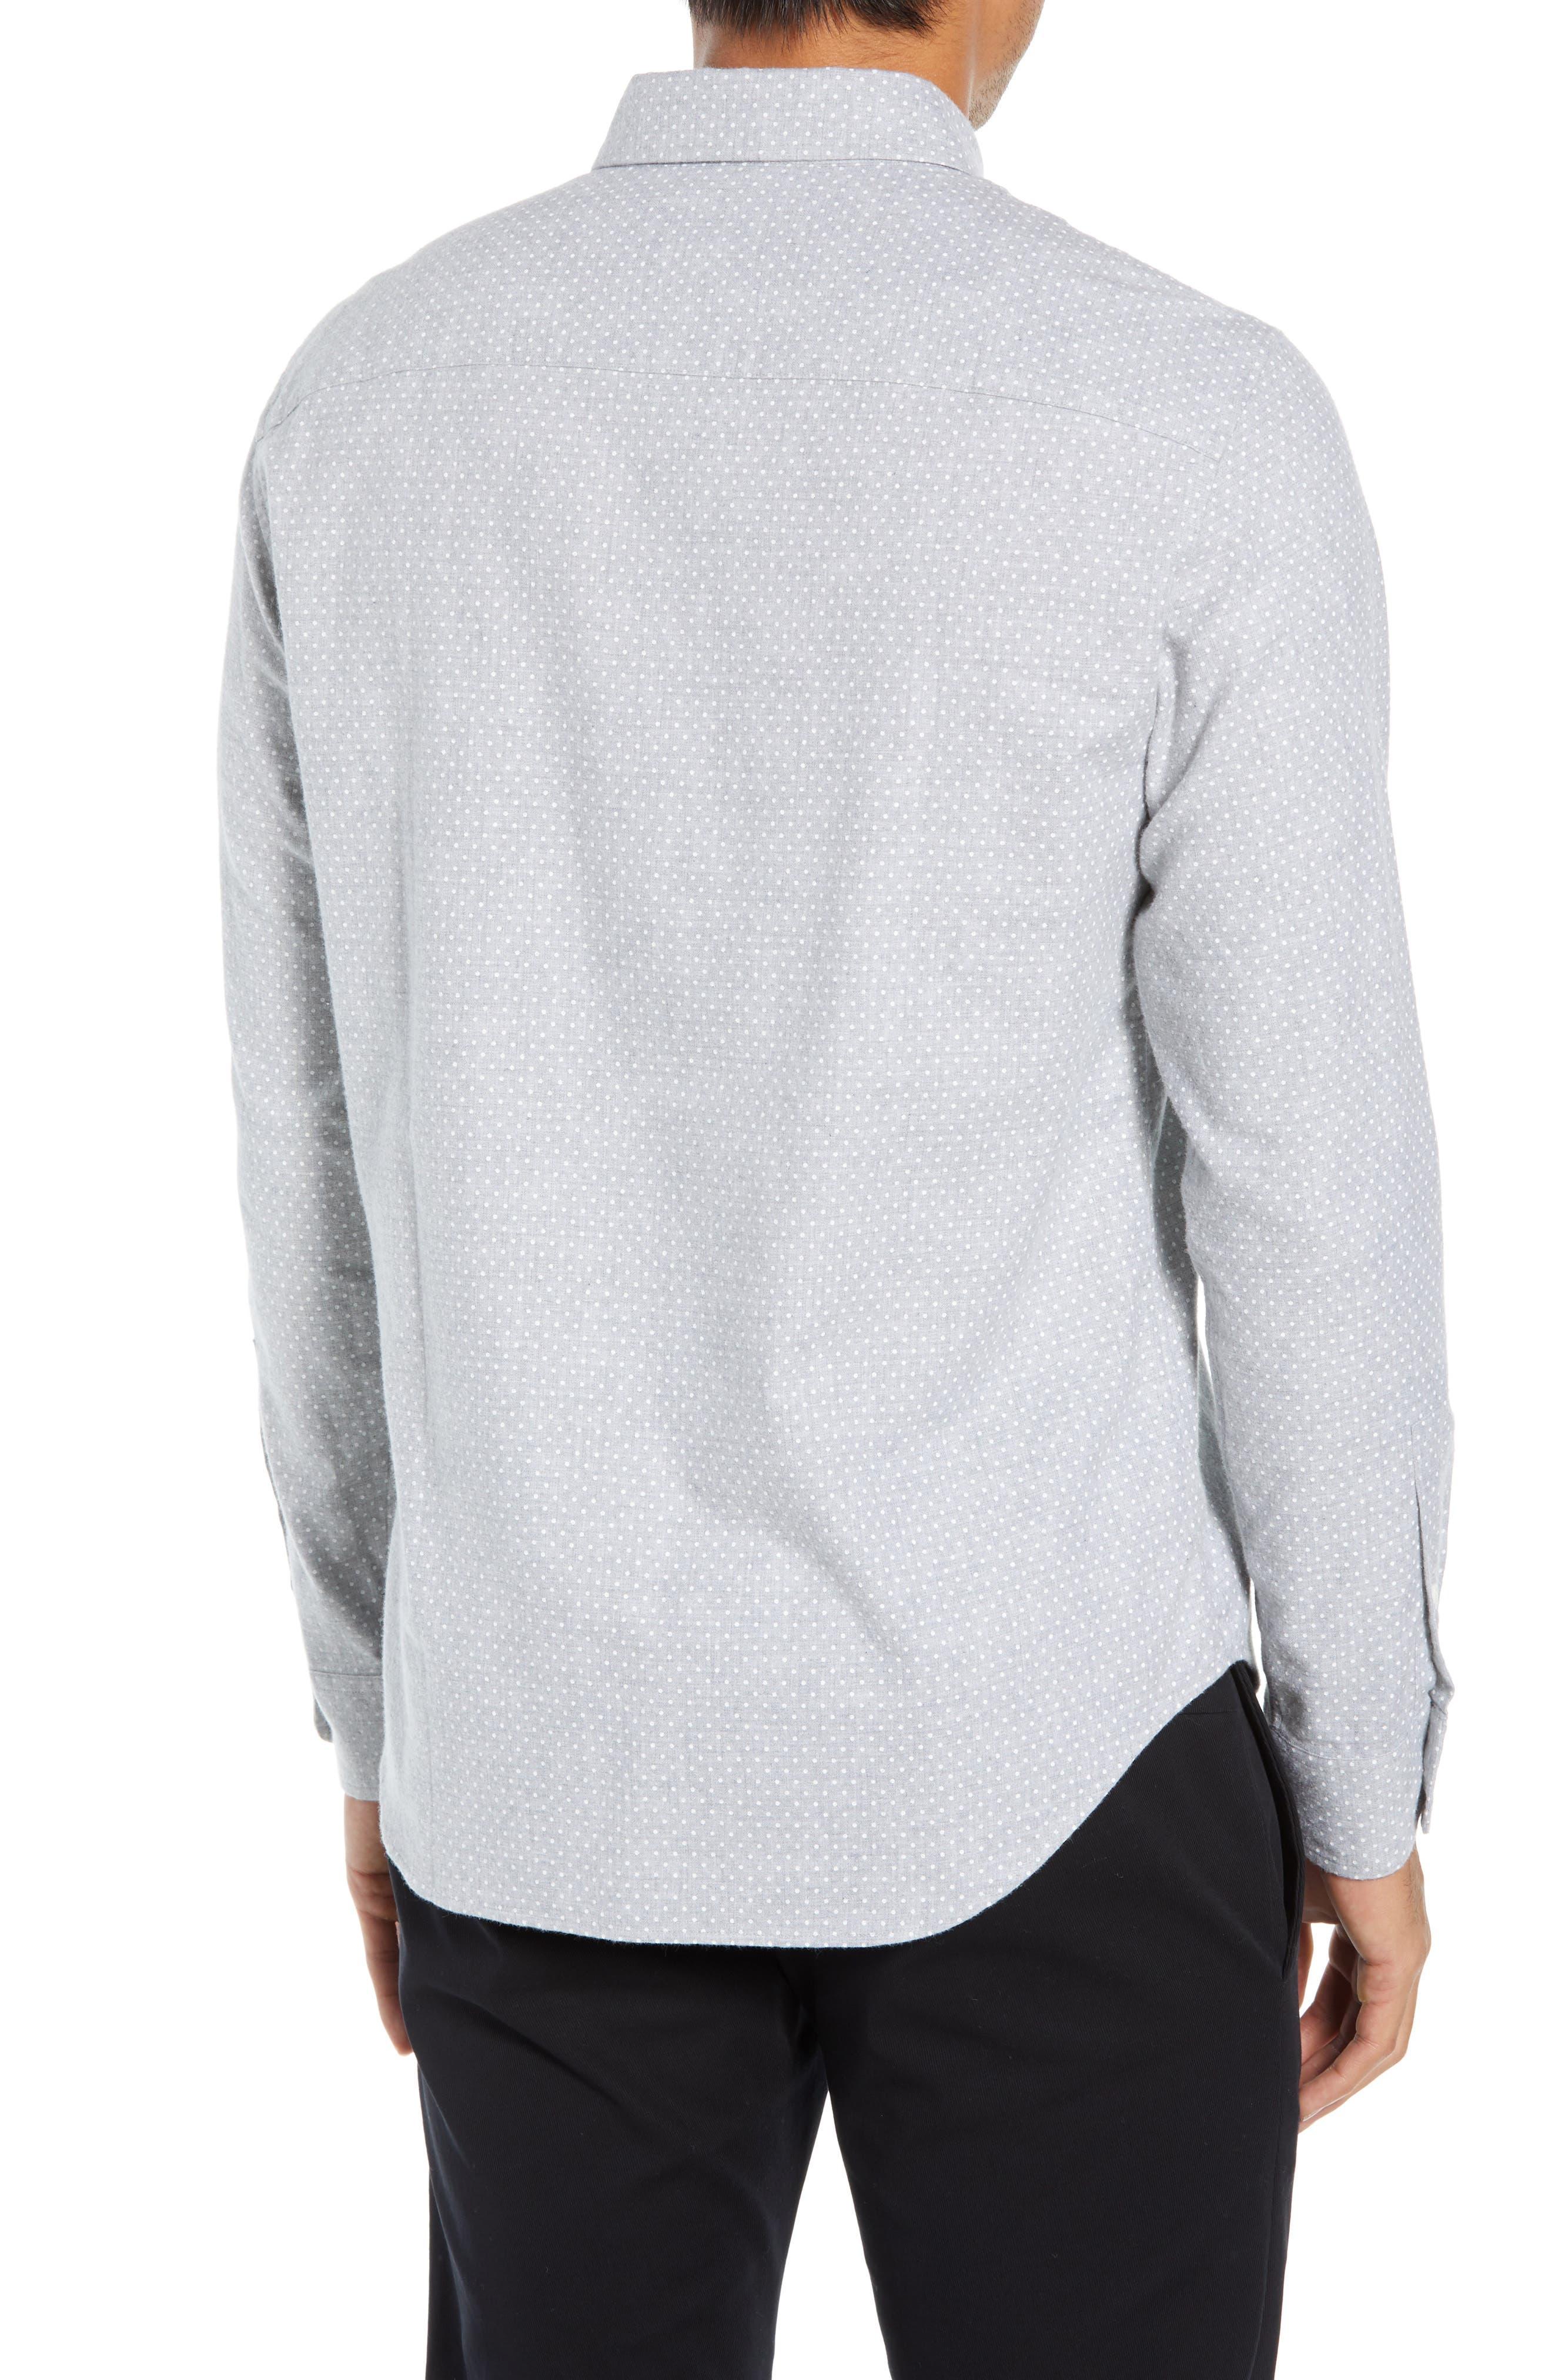 Polka Dot Cotton Flannel Sport Shirt,                             Alternate thumbnail 3, color,                             030